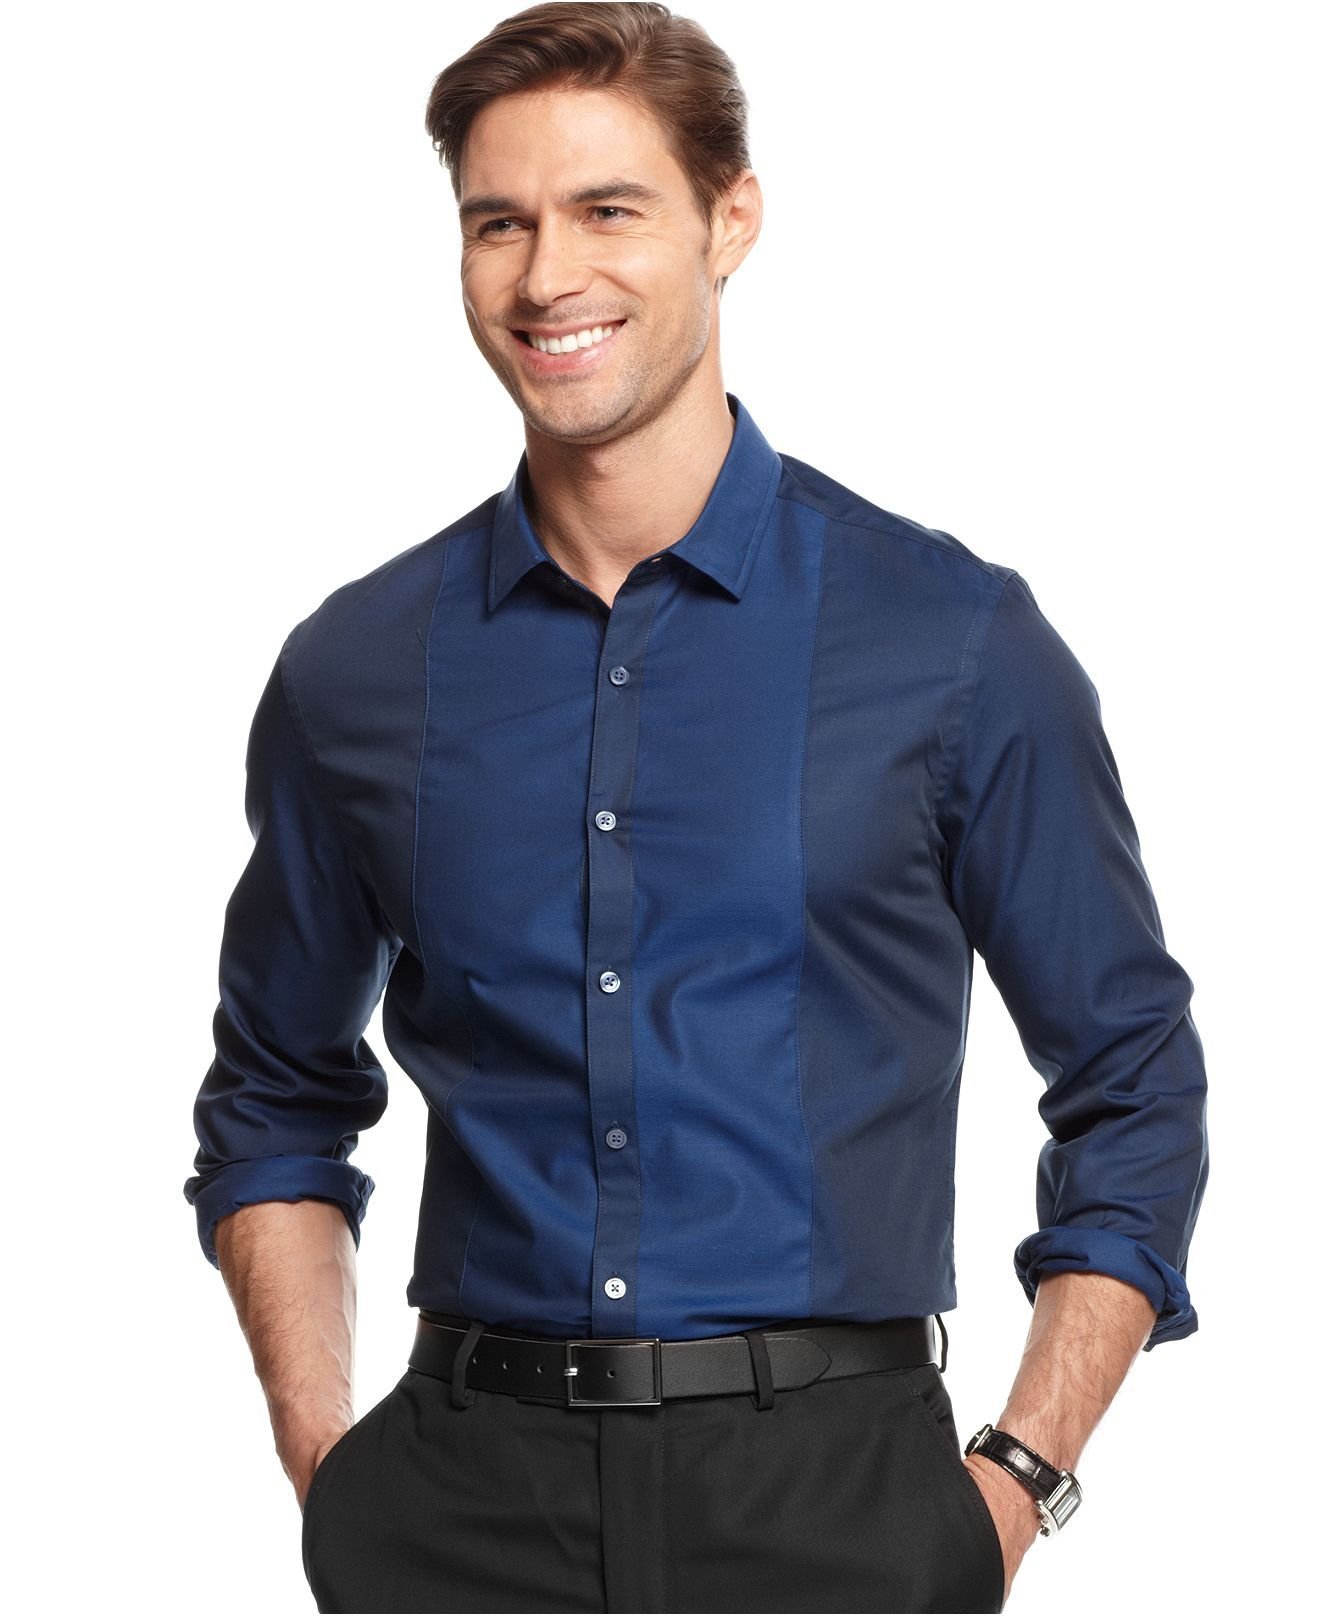 Alfani RED Shirt, Slim-Fit Long-Sleeve Lind Biface Pieced Shirt ...